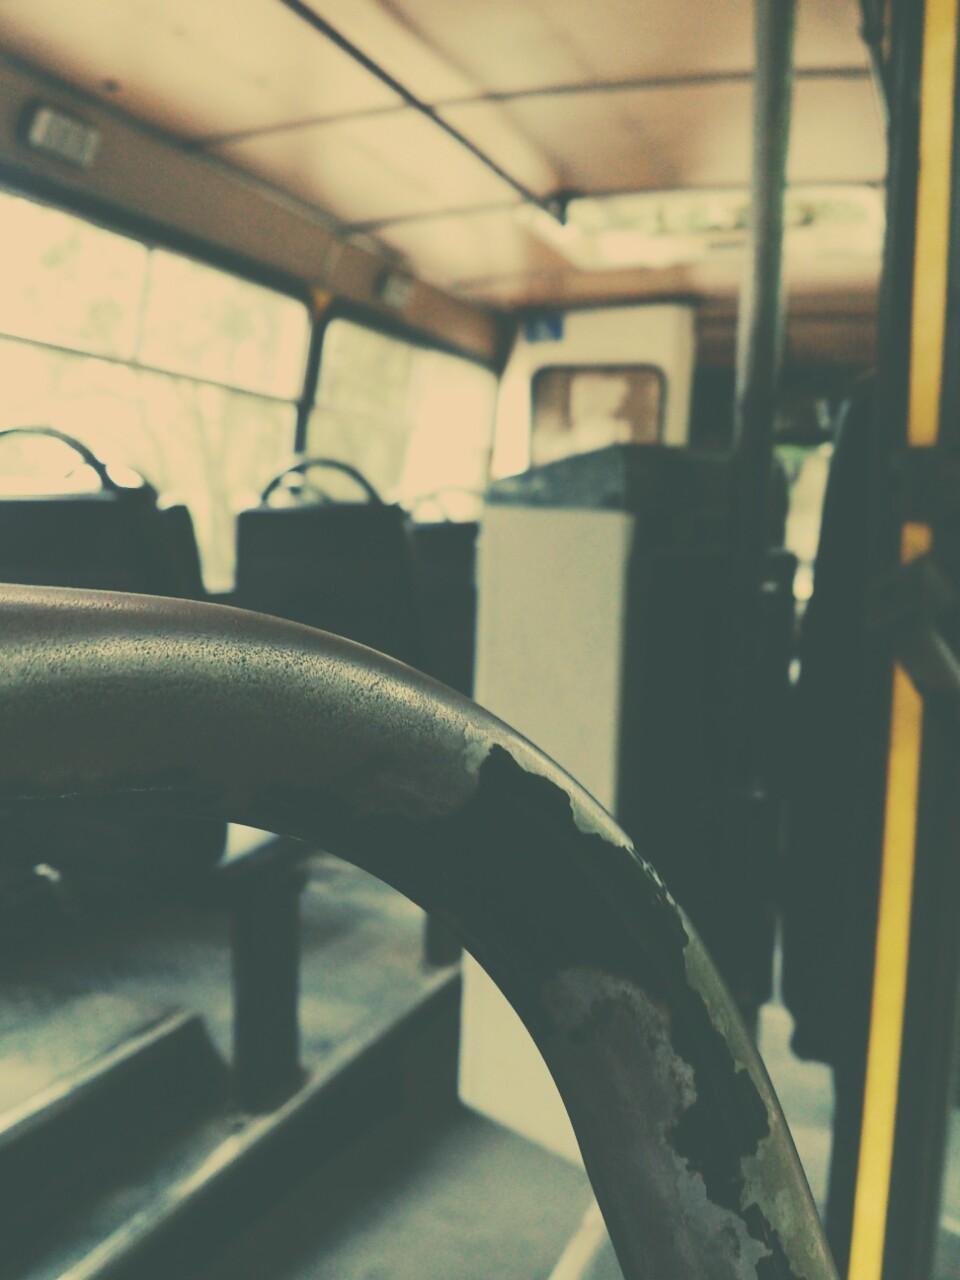 public-transport-georgia-6610fd828119bff